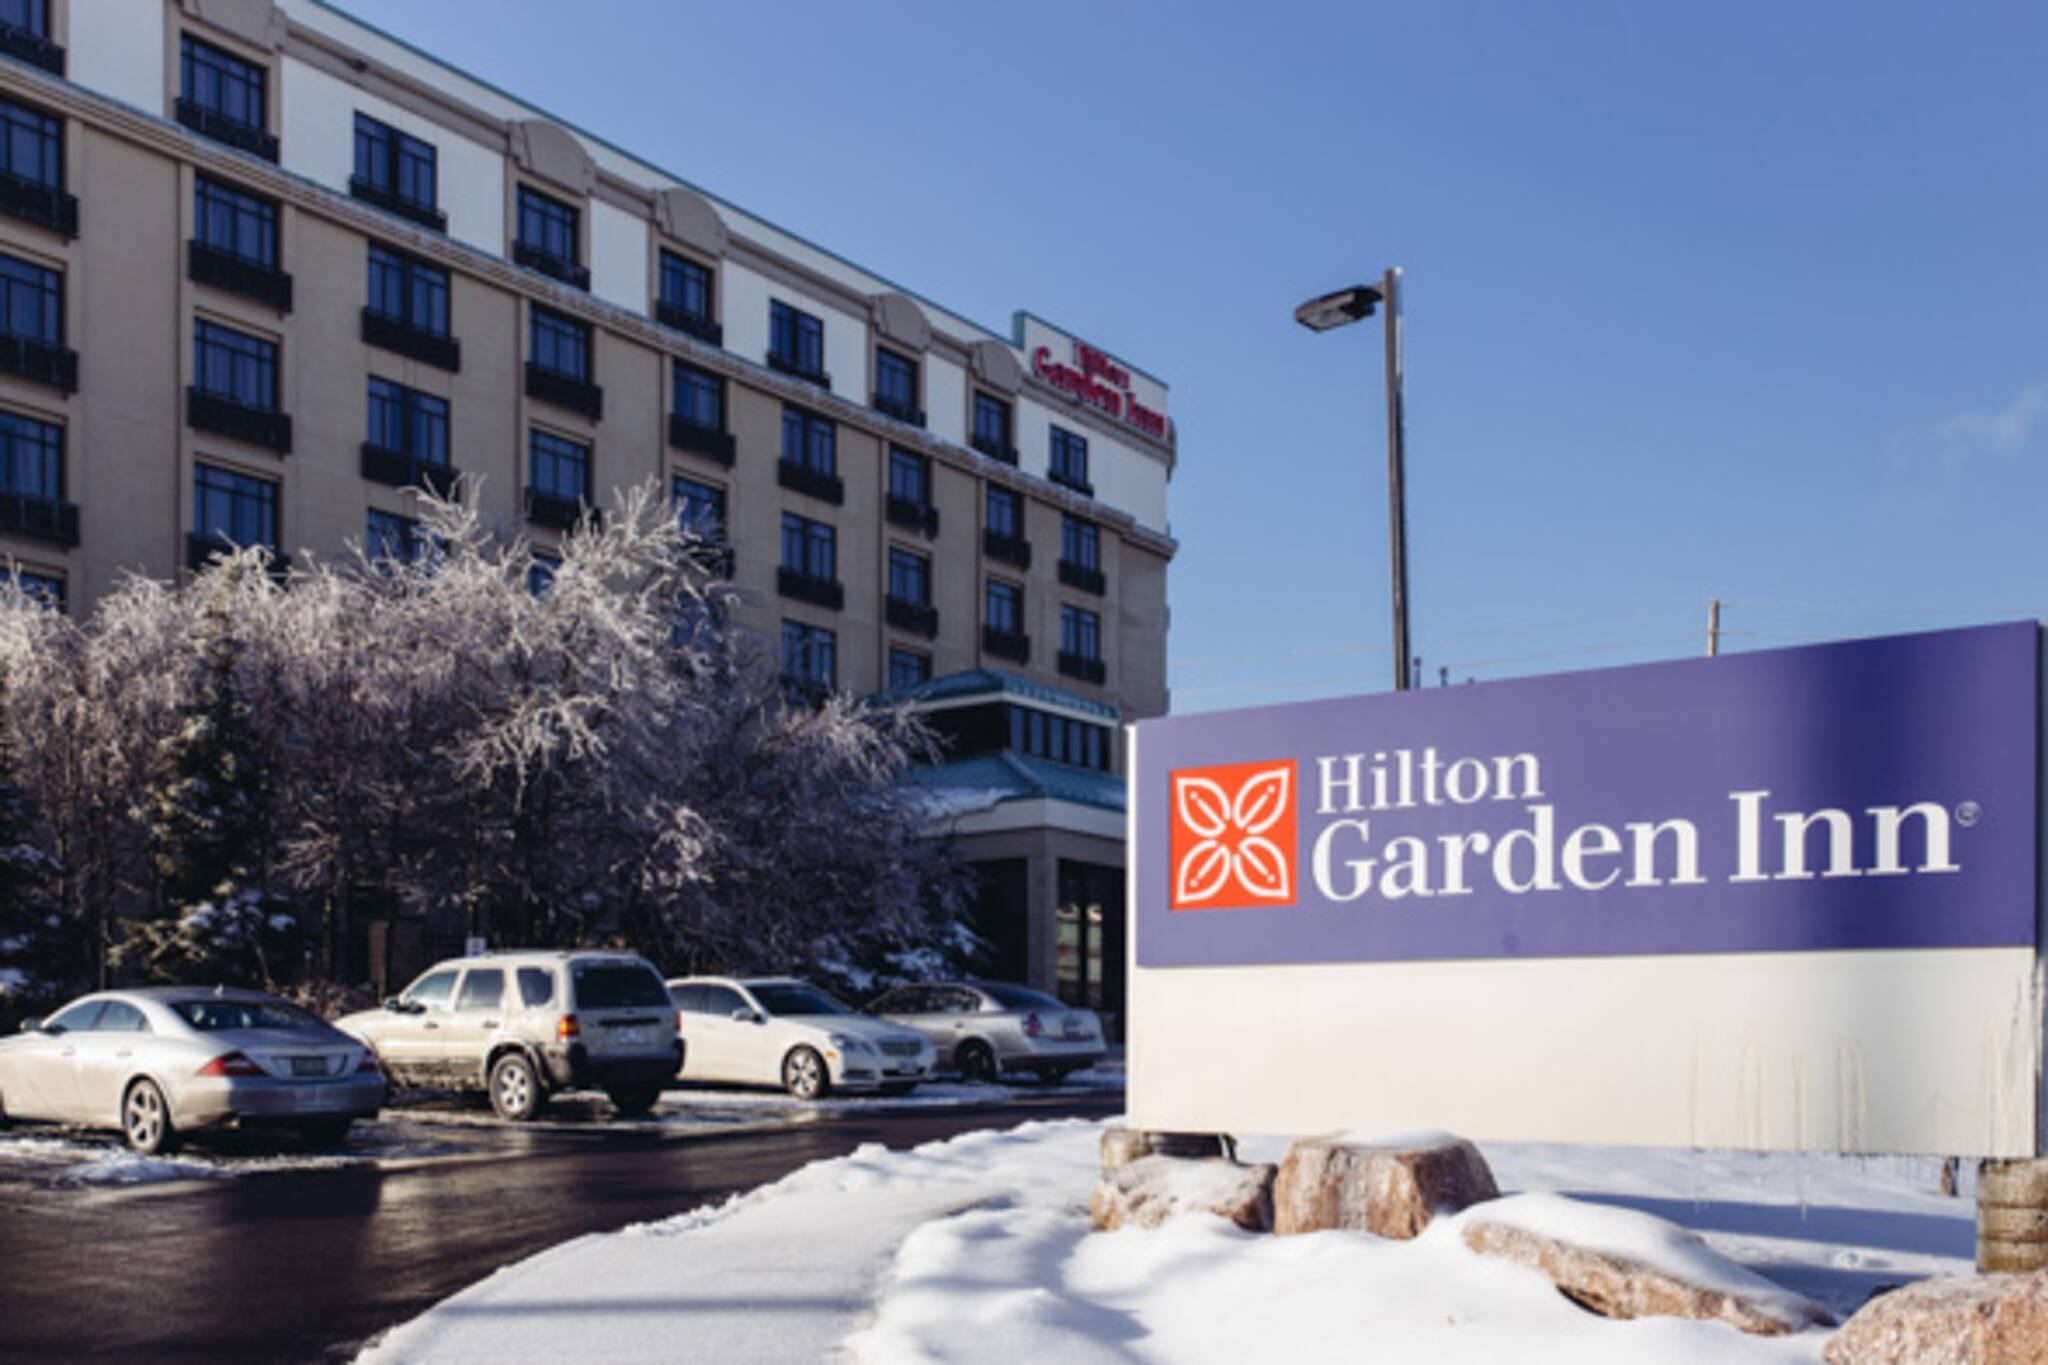 Hilton Garden Inn Markham